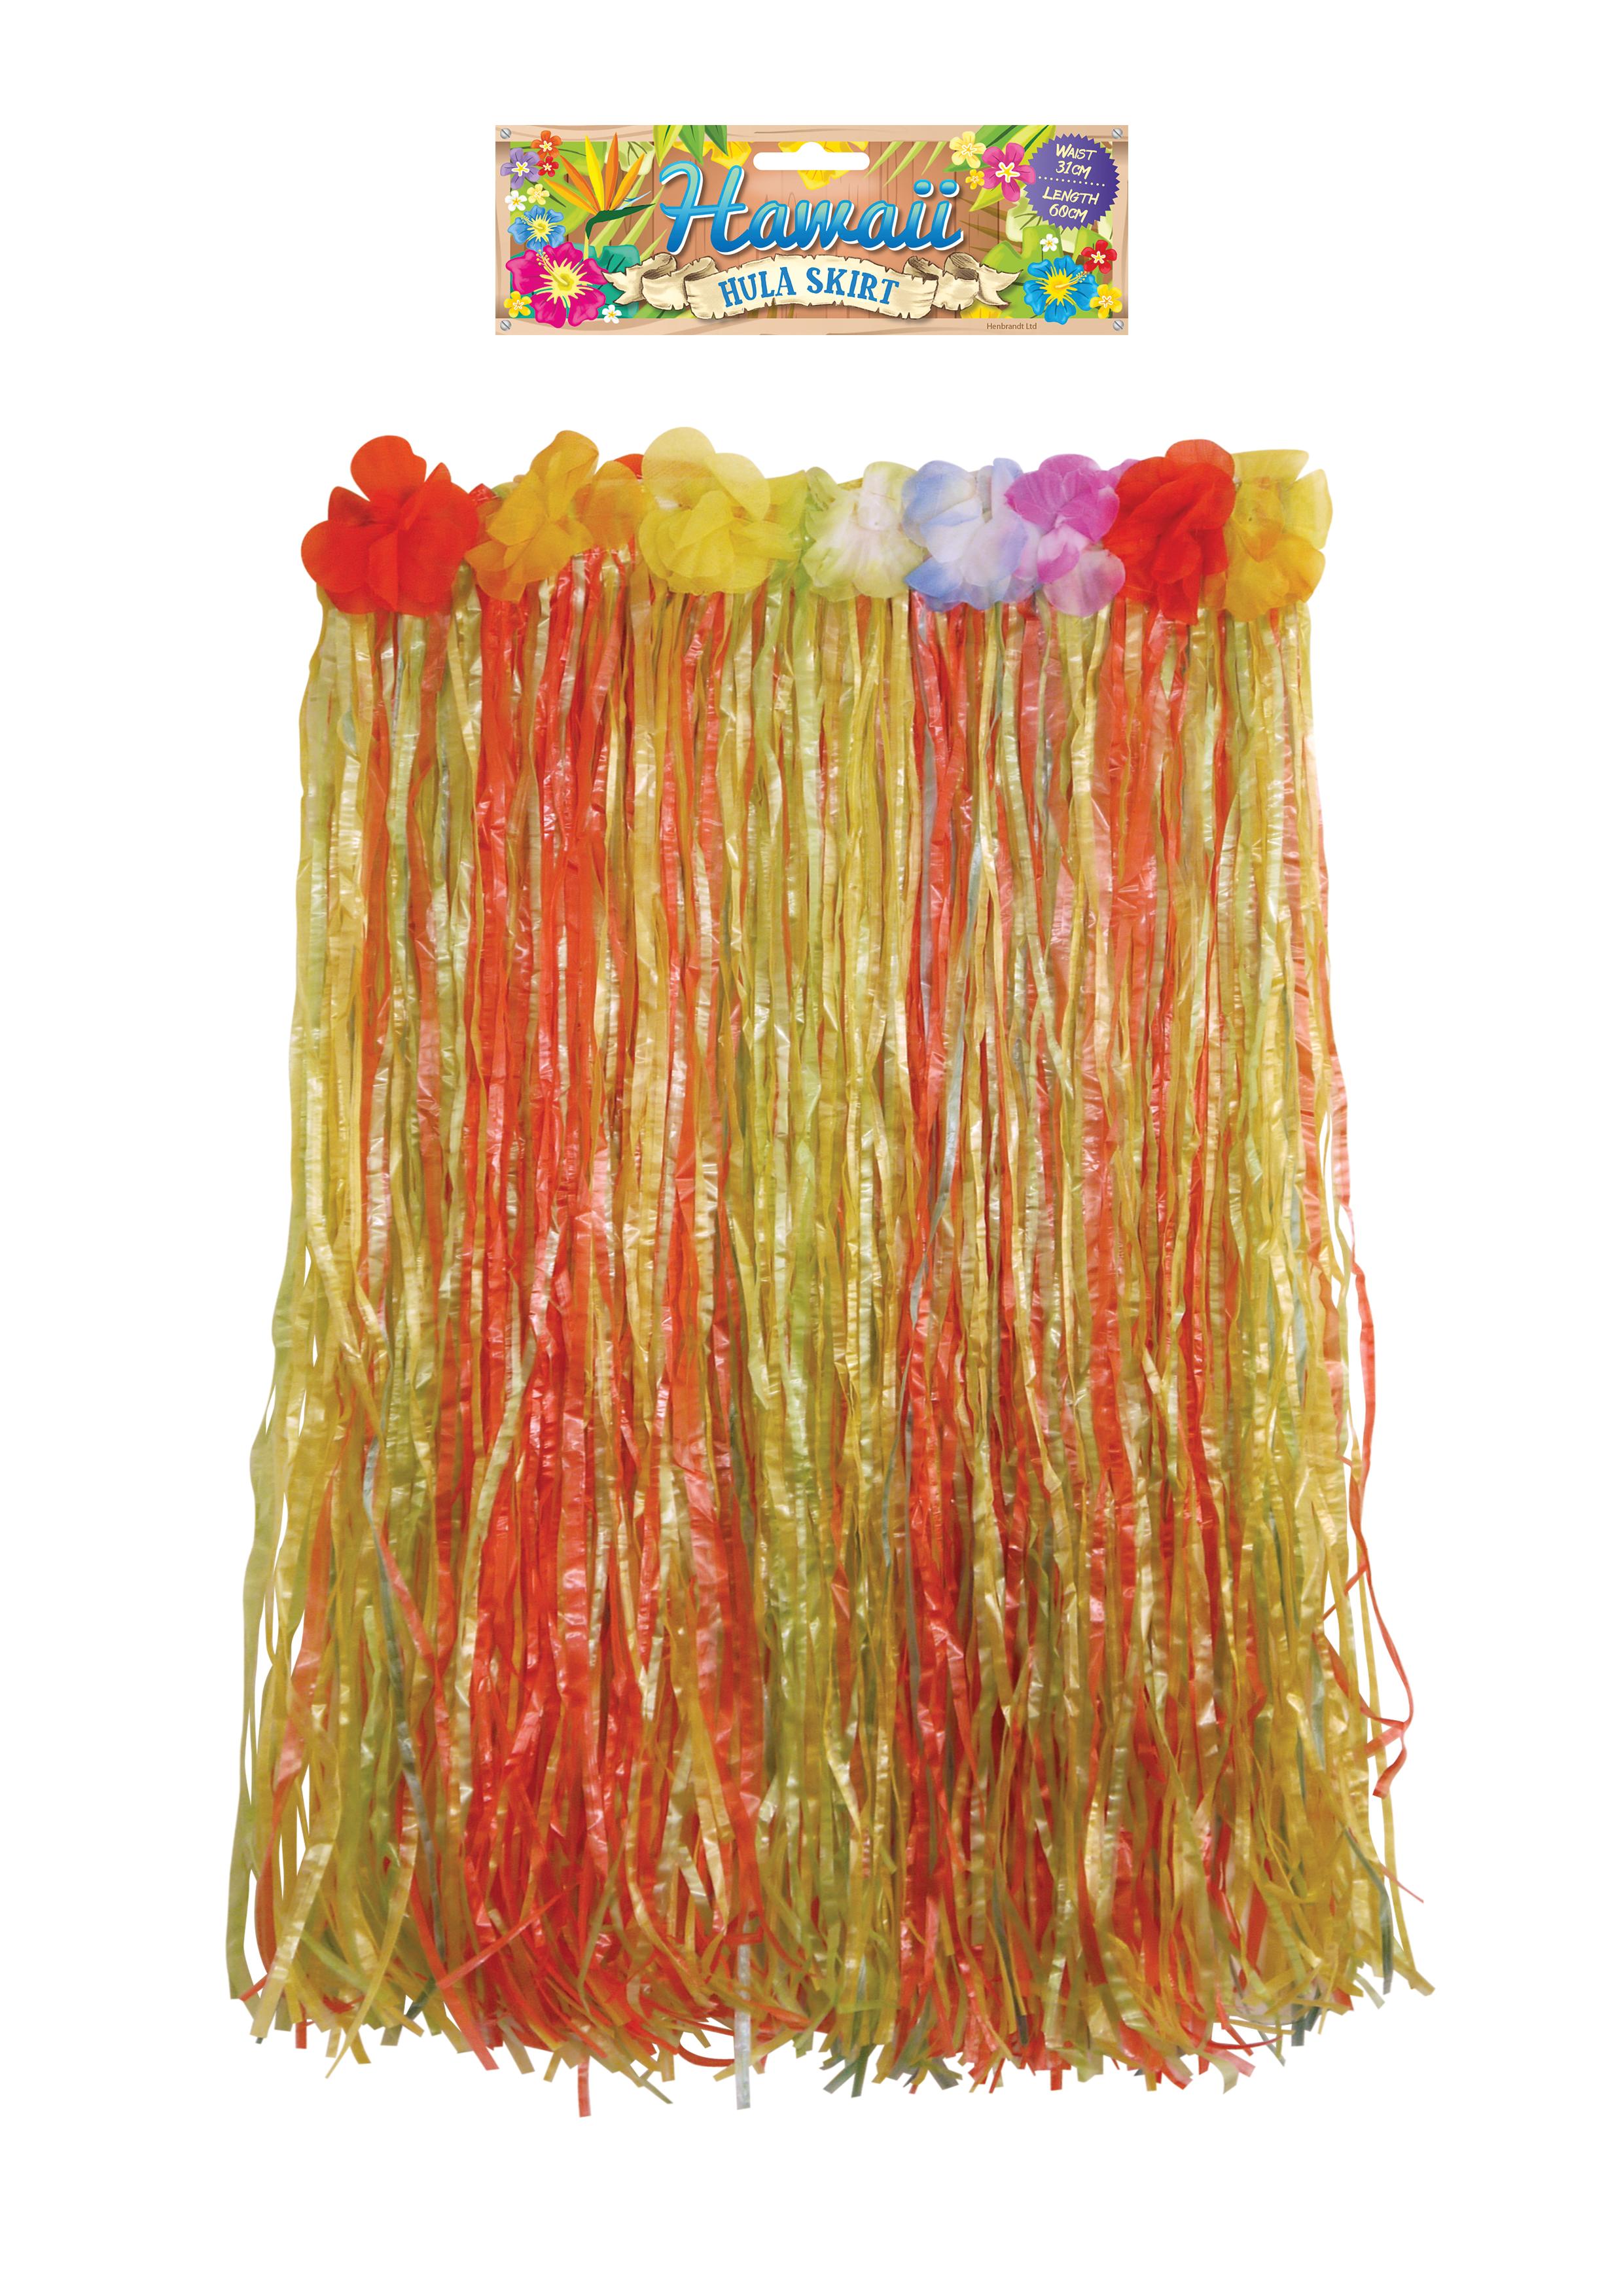 Adult Hula Skirt with Flowers 62cm W x 60cm L